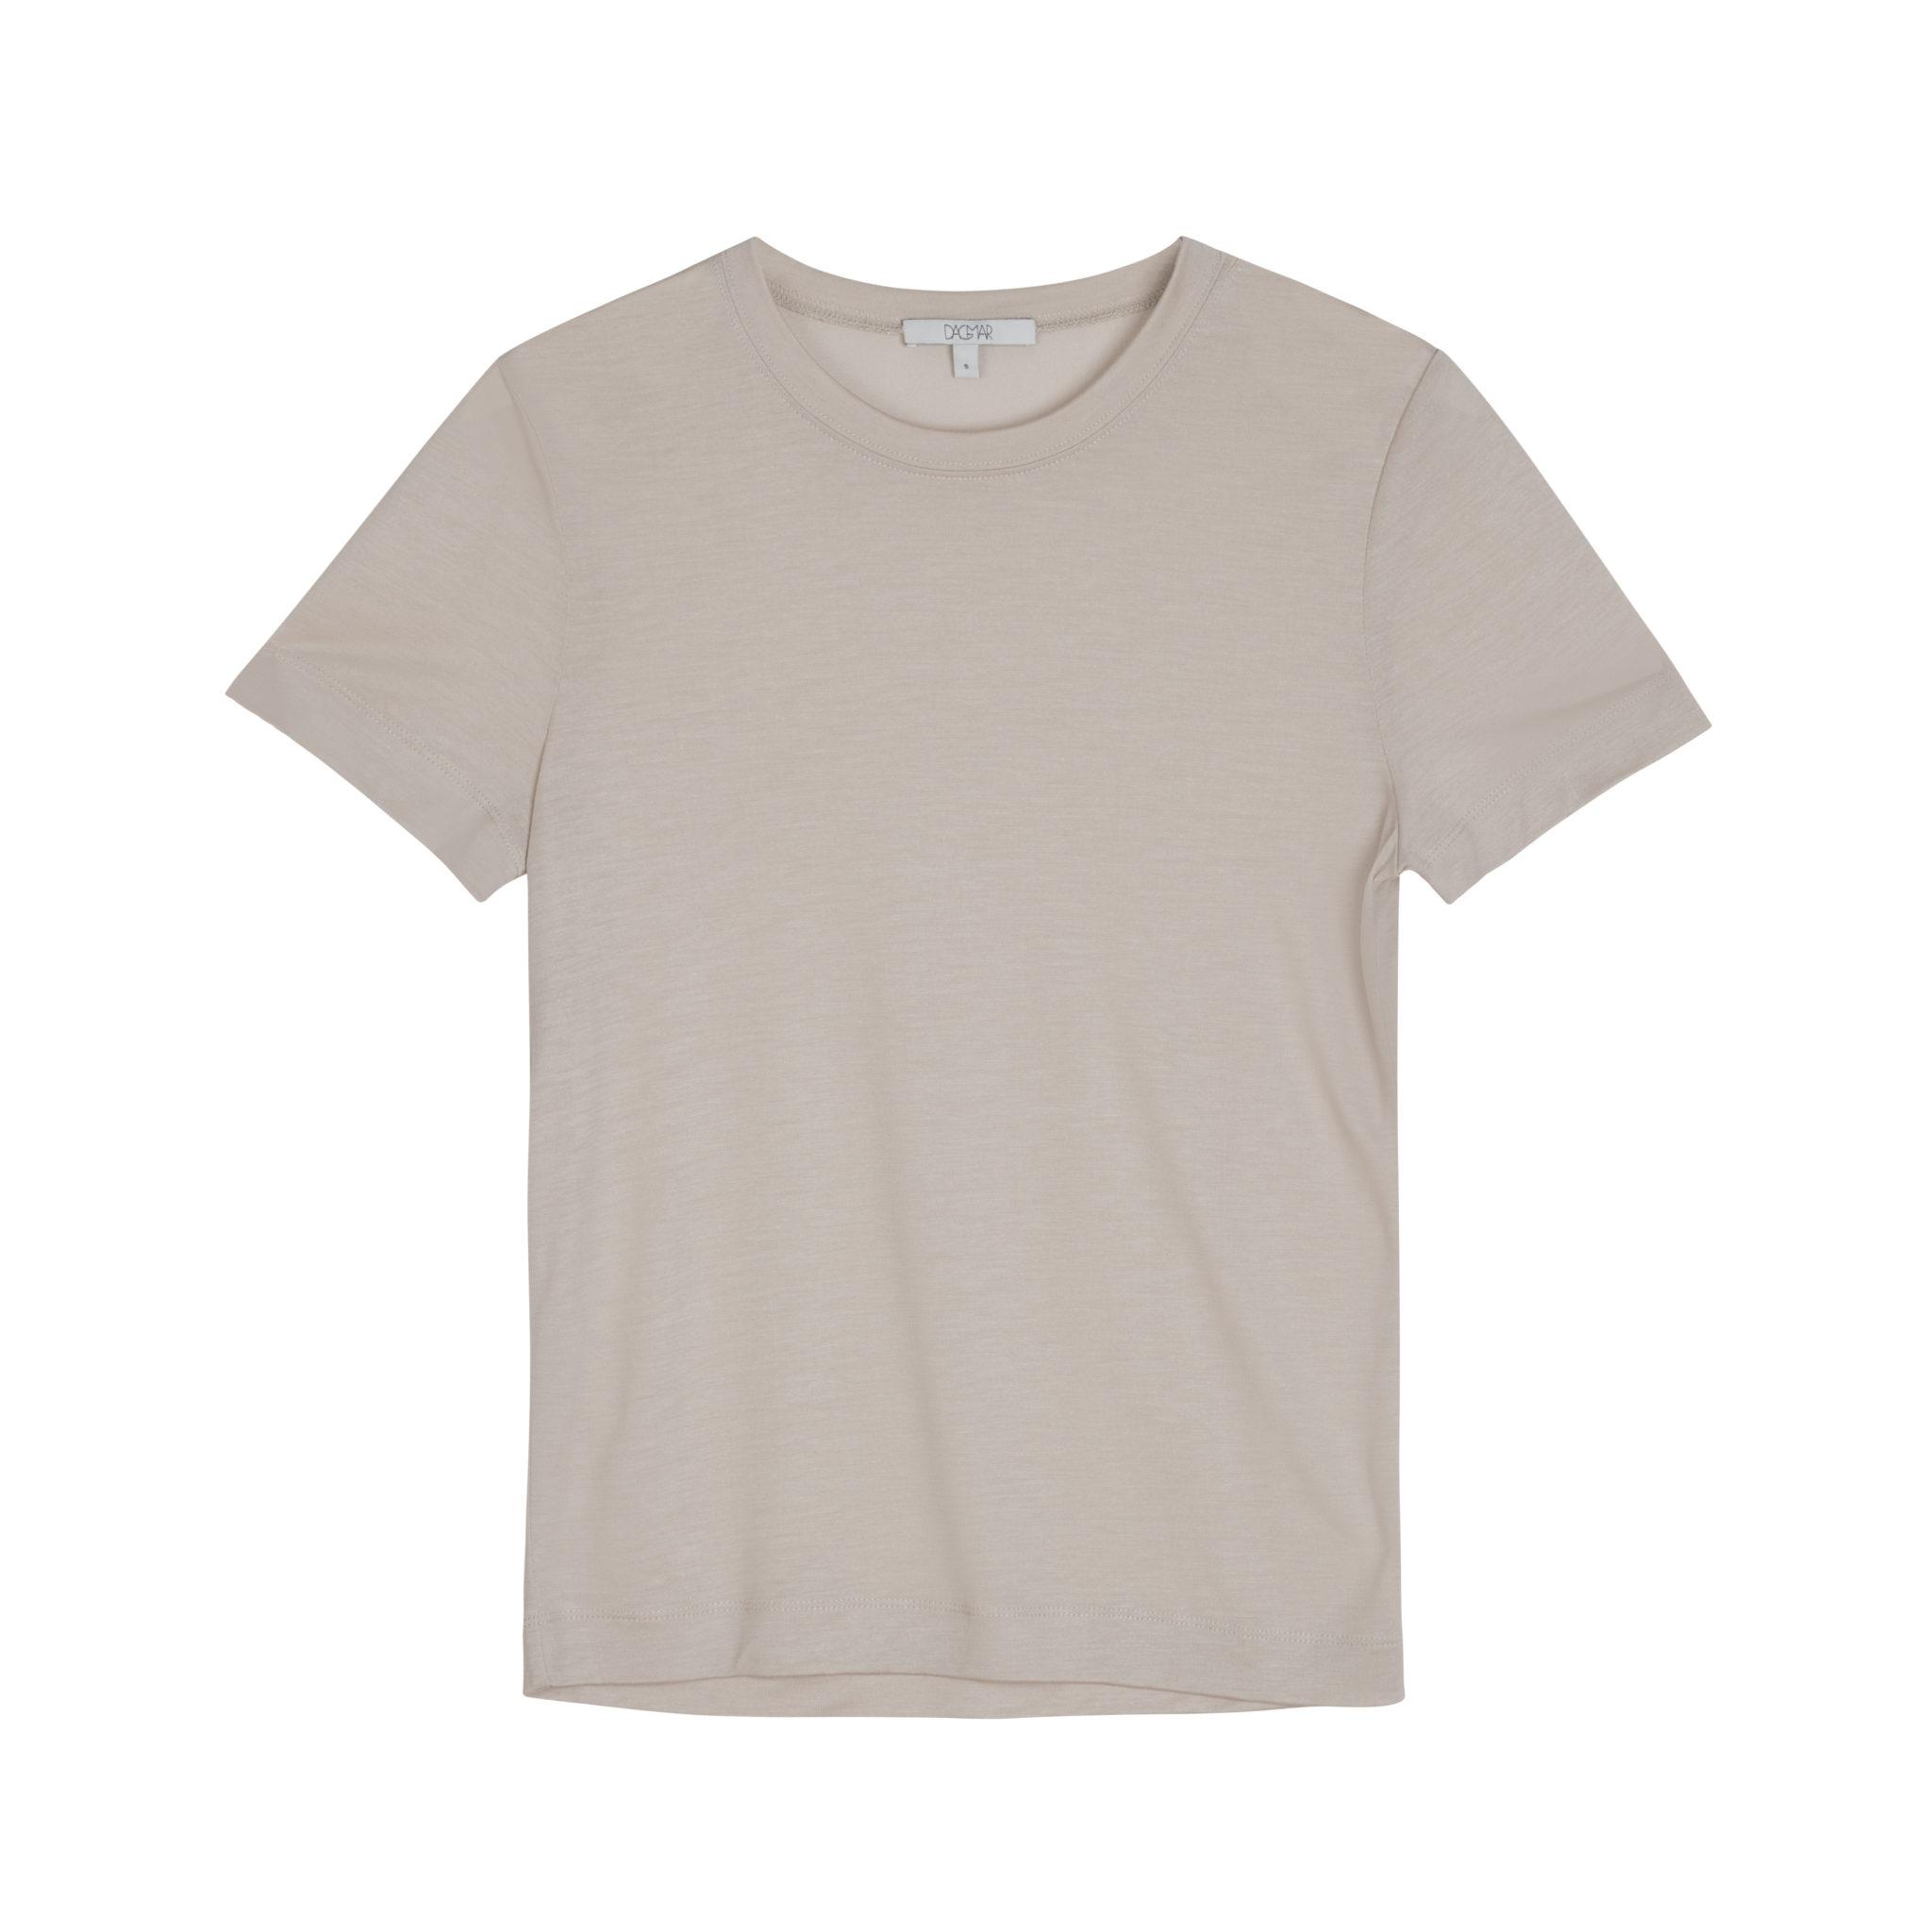 Claudia_T-shirt_beige